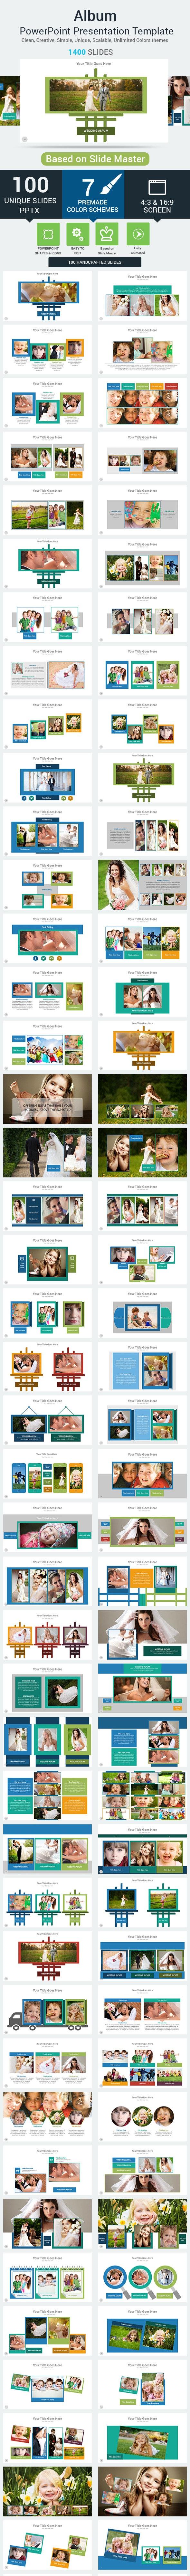 Album PowerPoint Presentation Template - Creative PowerPoint Templates